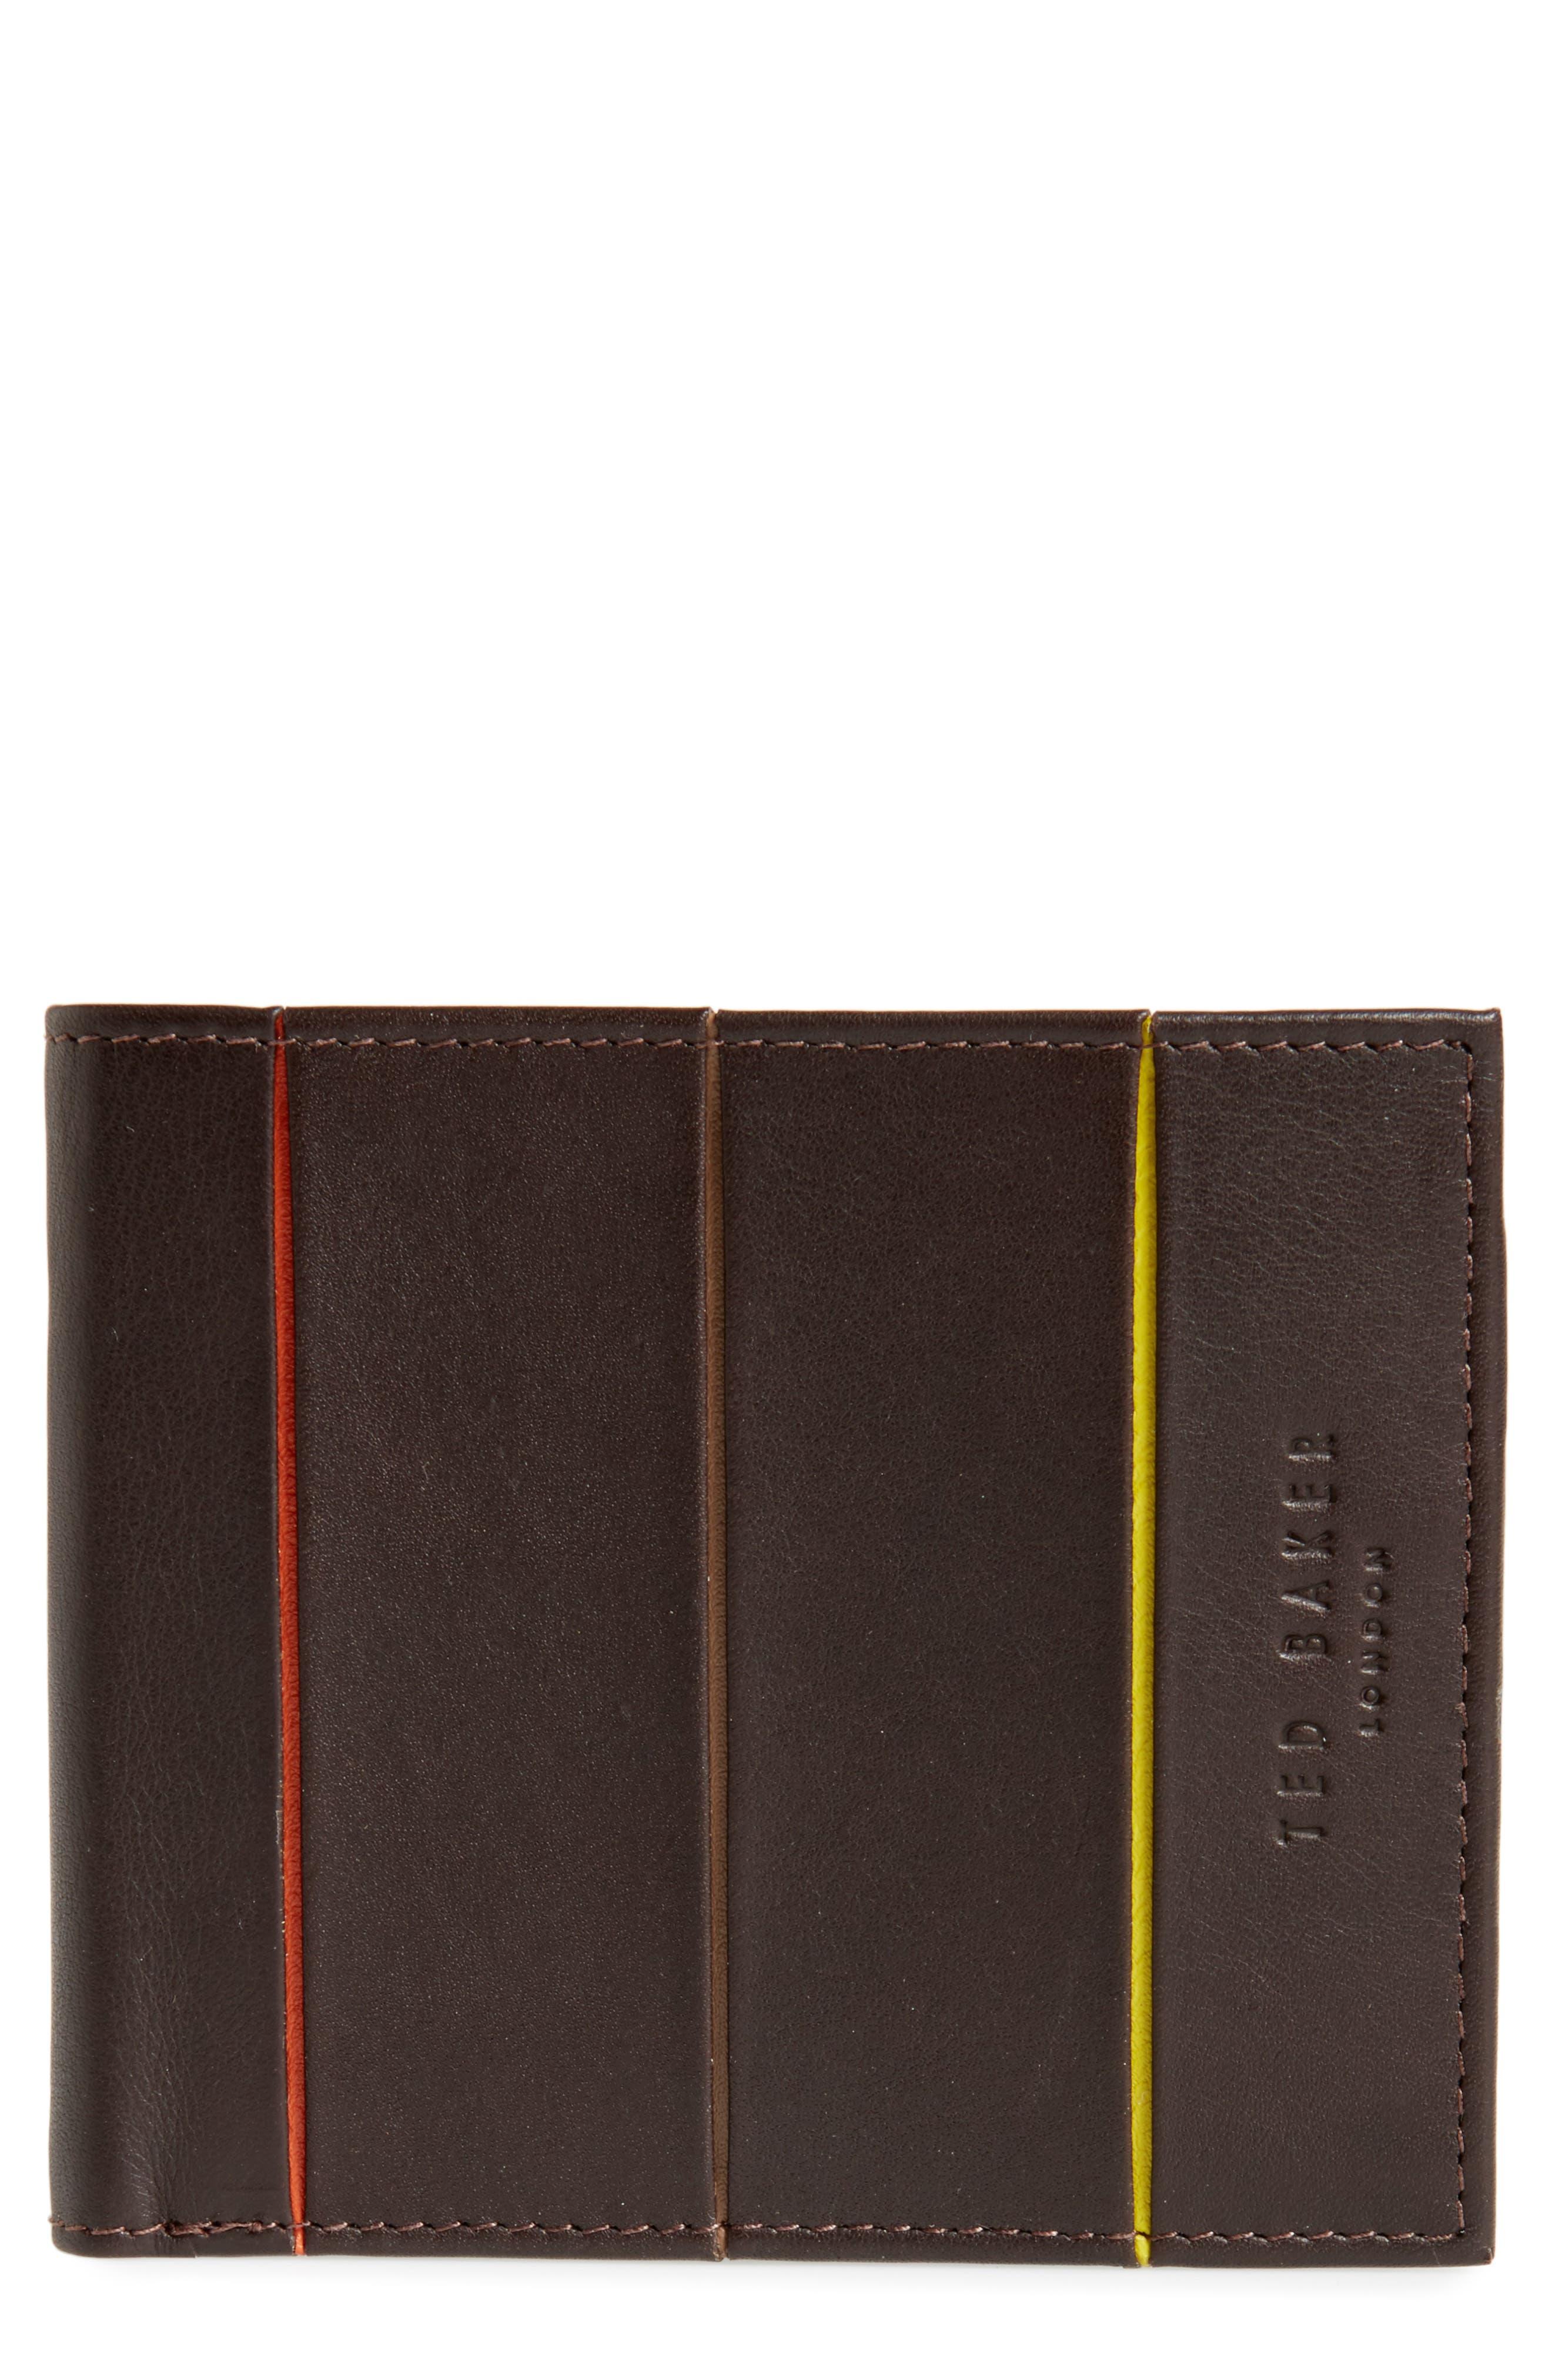 Bourbon Stripe Leather Billfold,                         Main,                         color, Chocolate